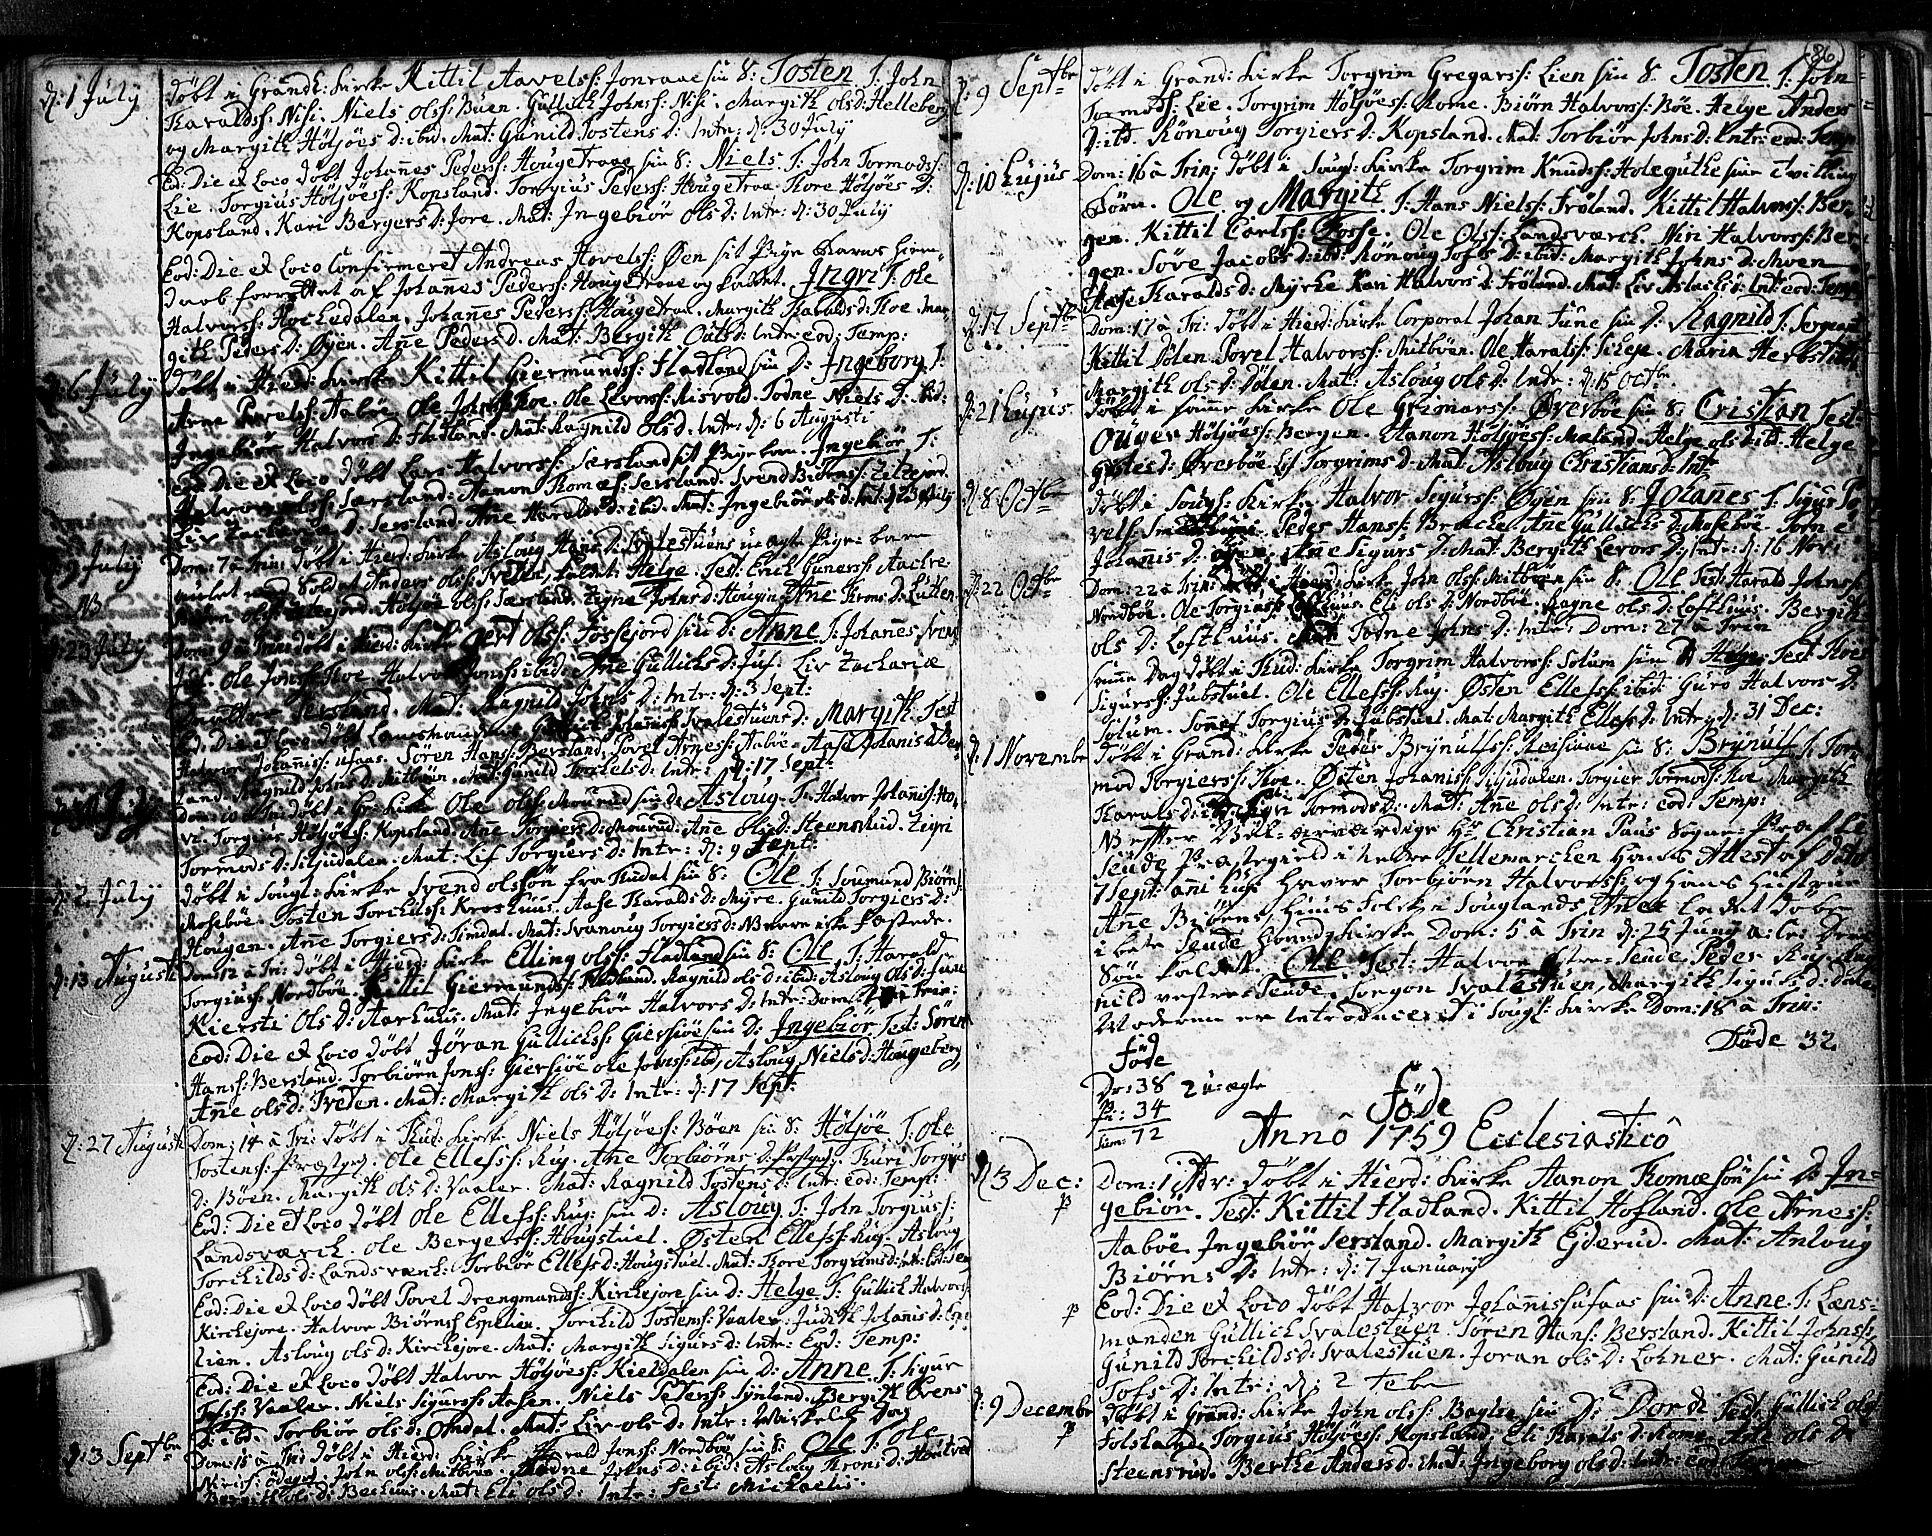 SAKO, Hjartdal kirkebøker, F/Fa/L0003: Ministerialbok nr. I 3, 1727-1775, s. 86